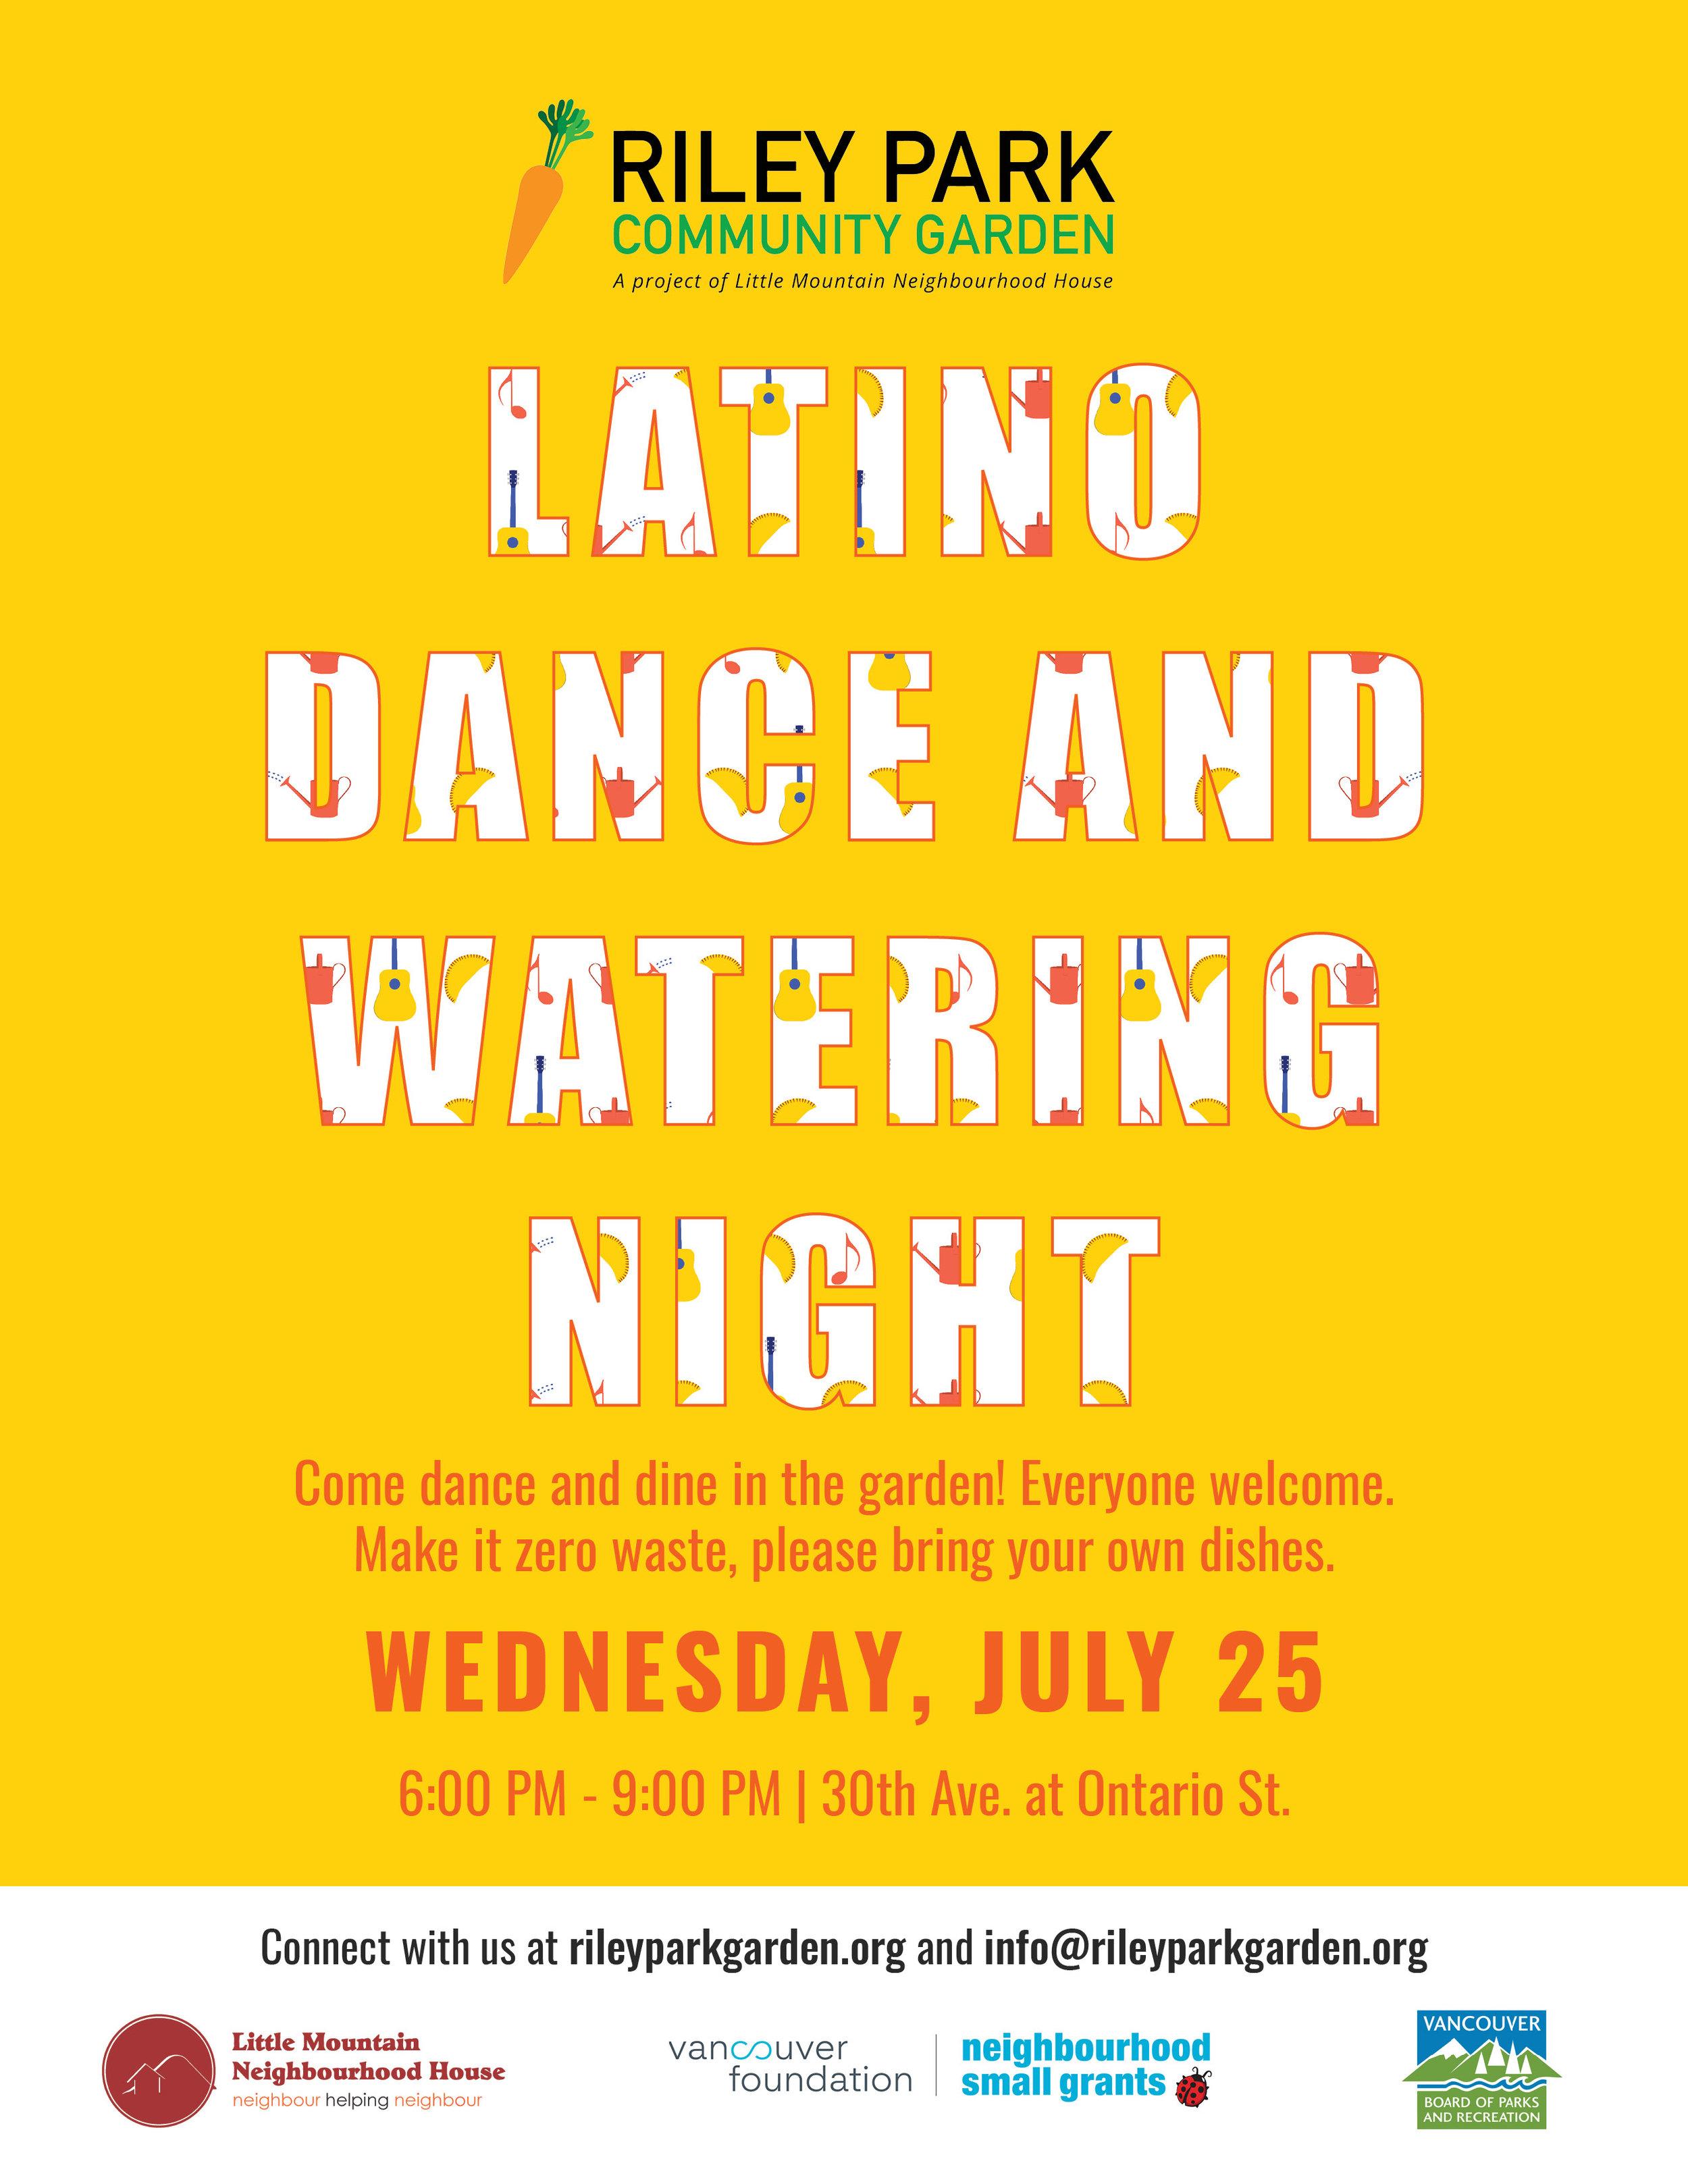 180718 FINAL 3 Latino Night Poster_v1wl .jpg